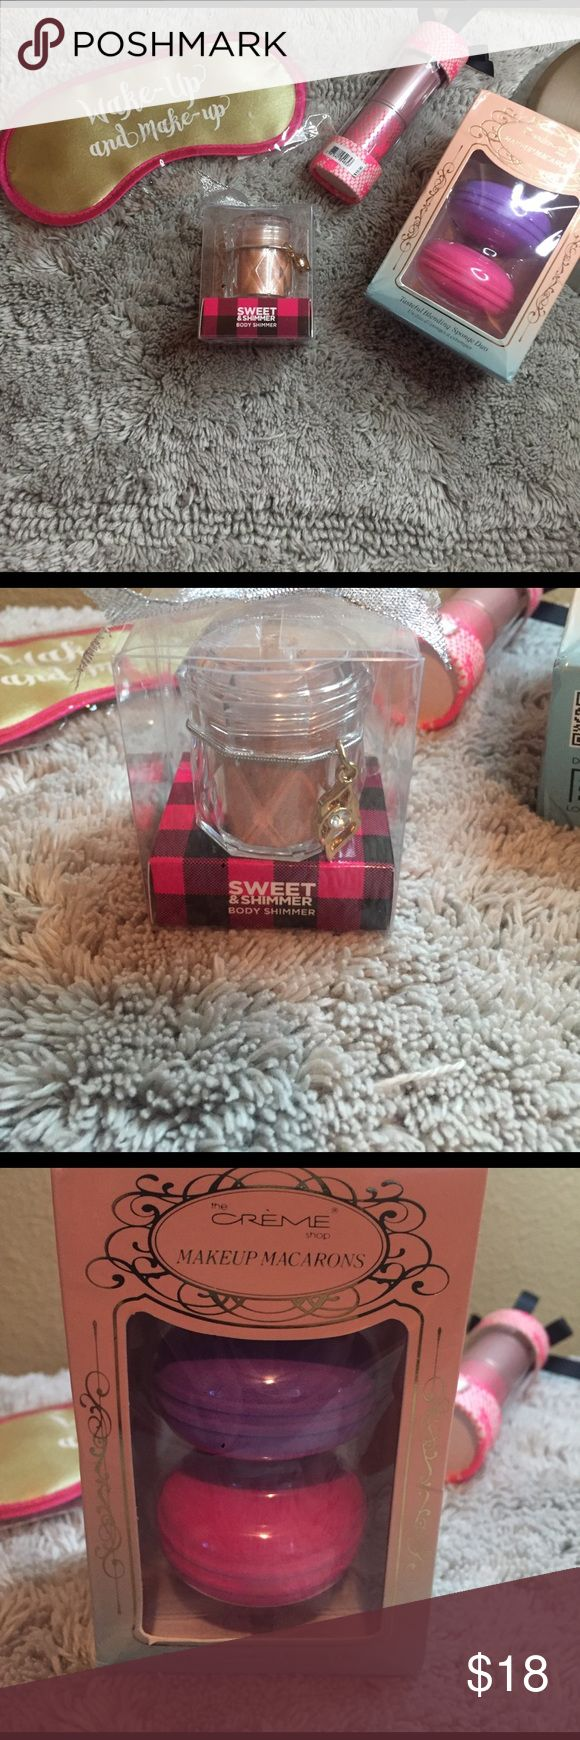 Beauty Bundle 💟🎀 Wake Up & Makeup. Victoria's Secret Crush. Makeup Macarons Sponge. Sweet & Shimmer Body Shimmer Makeup